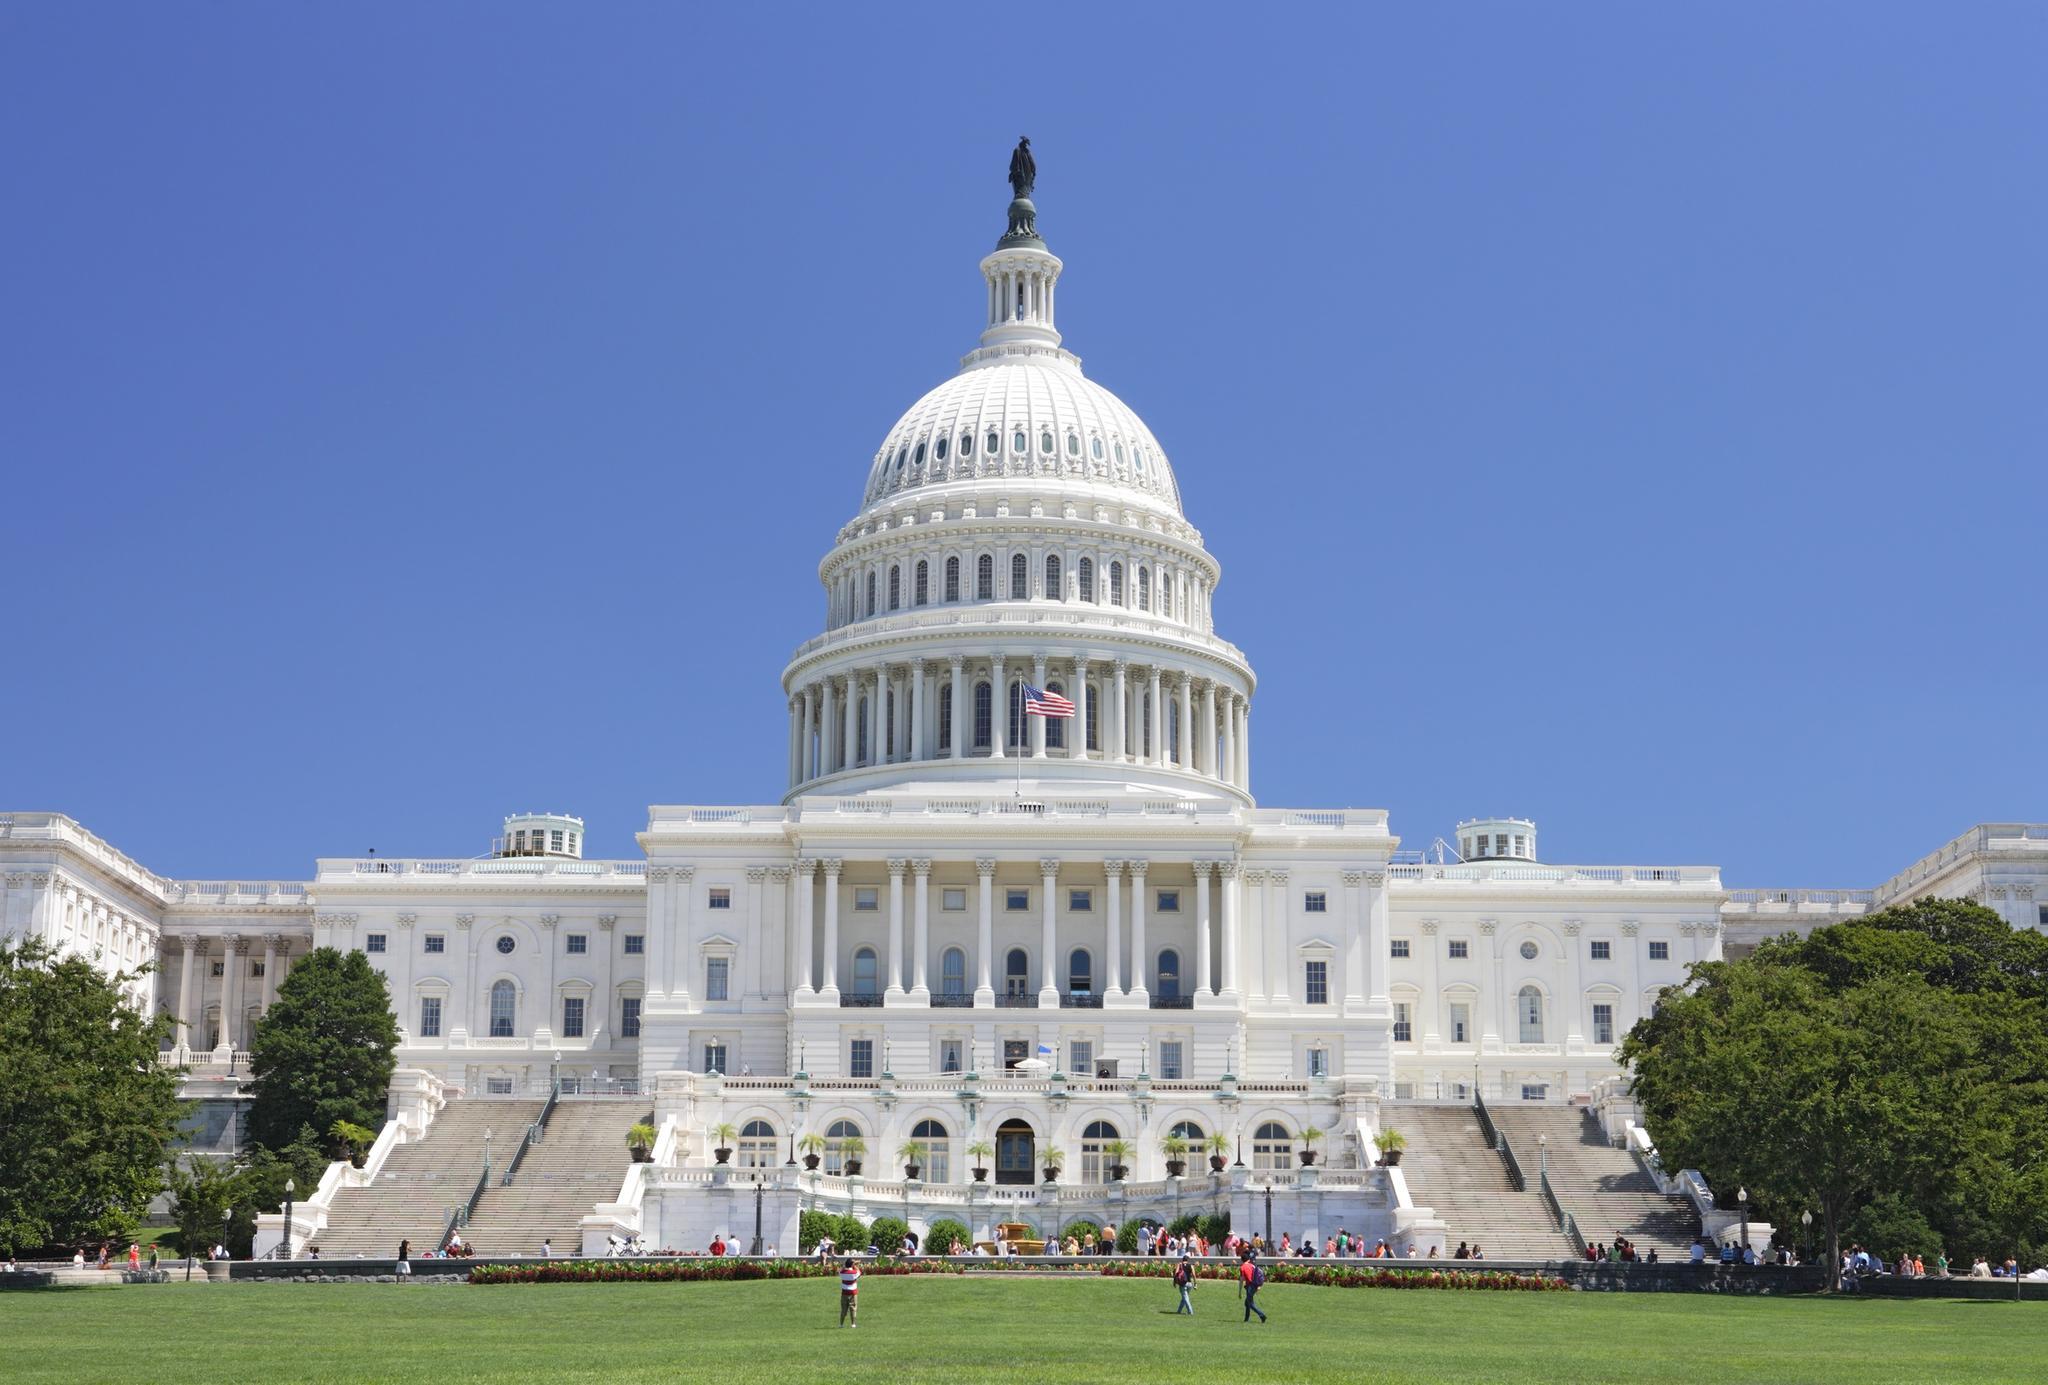 Điện Capitol